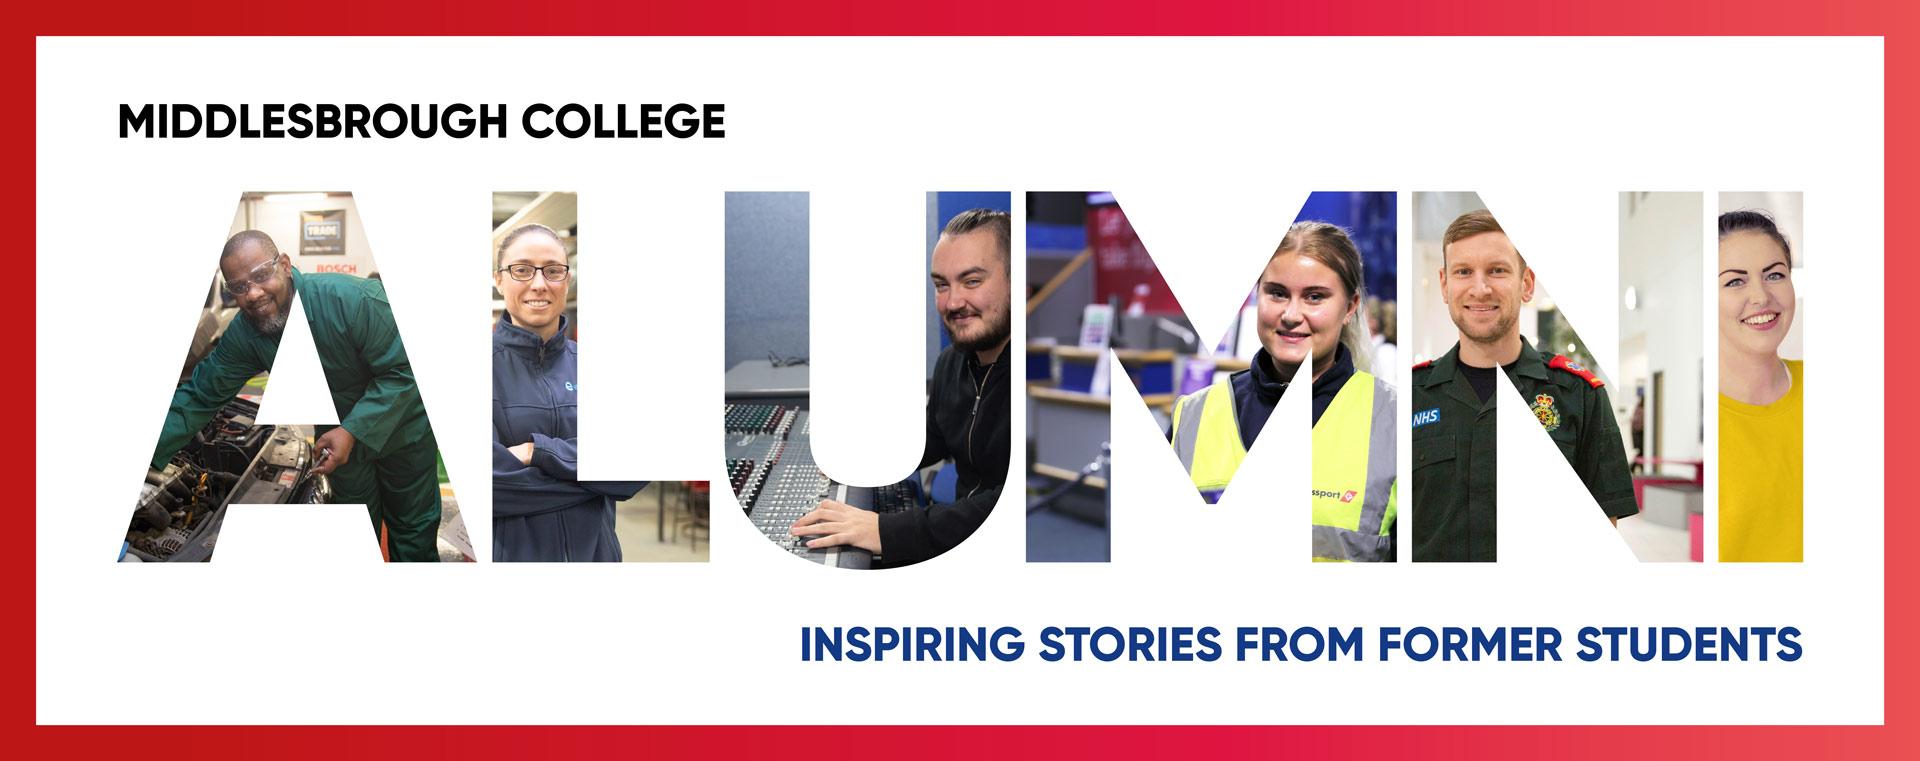 Middlesbrough College Alumni